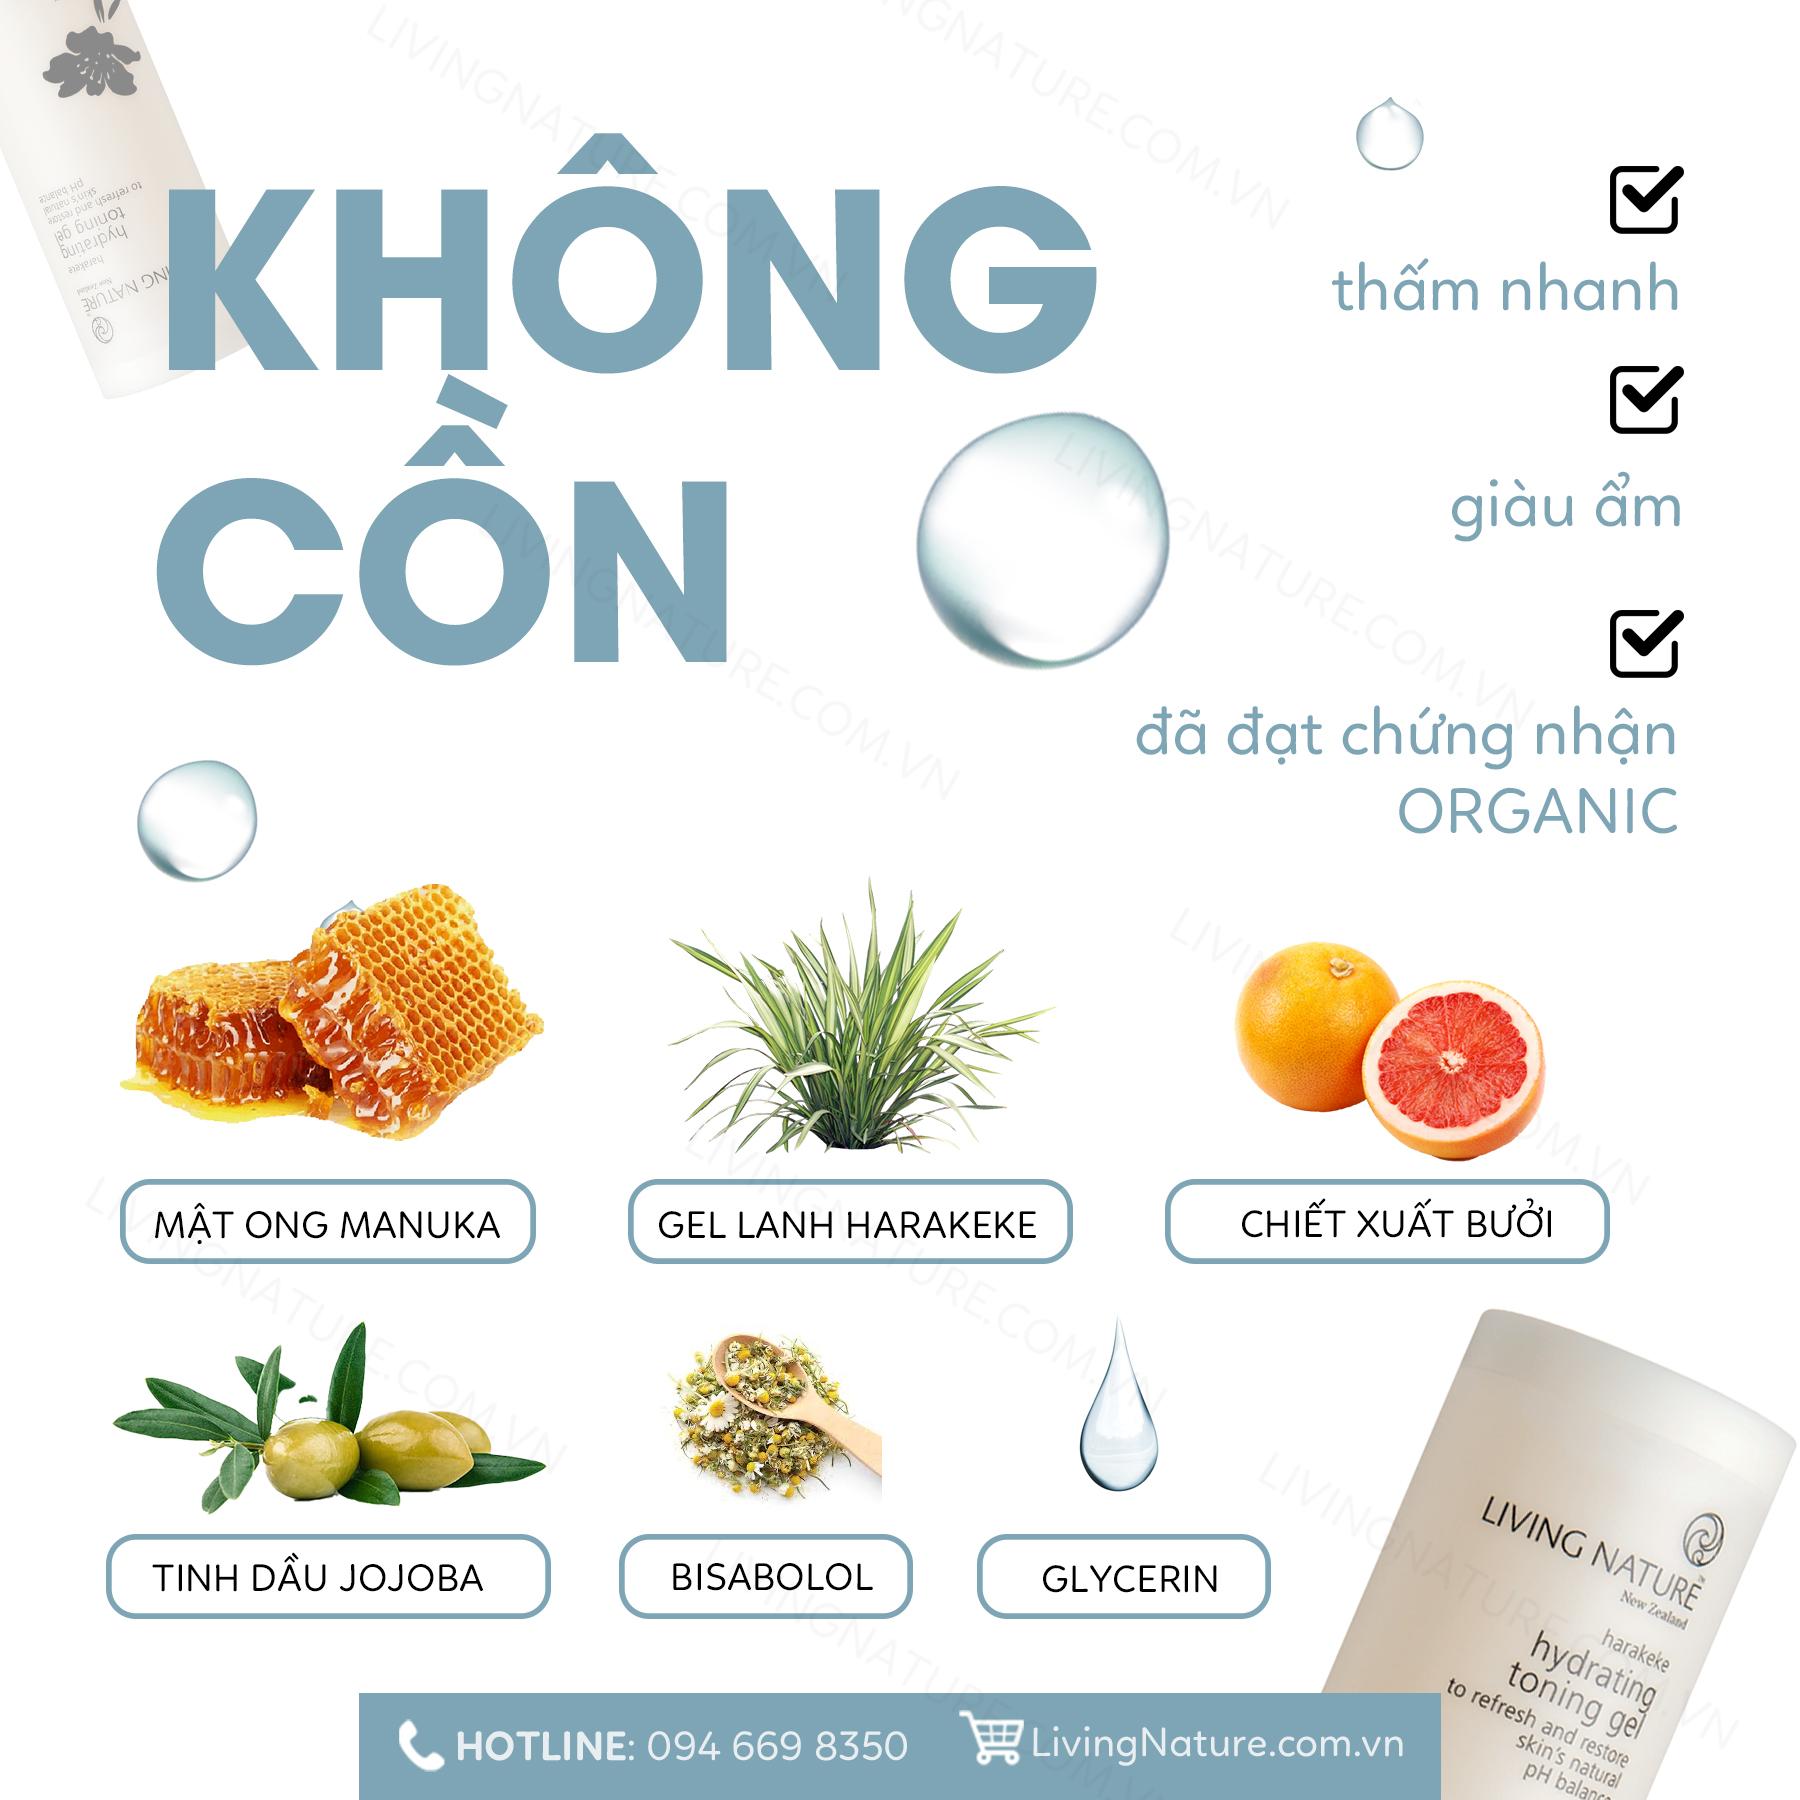 Hydrating Toning Gel - 'Gel cân bằng da' cần có của làn da dầu, dễ nổi mụn